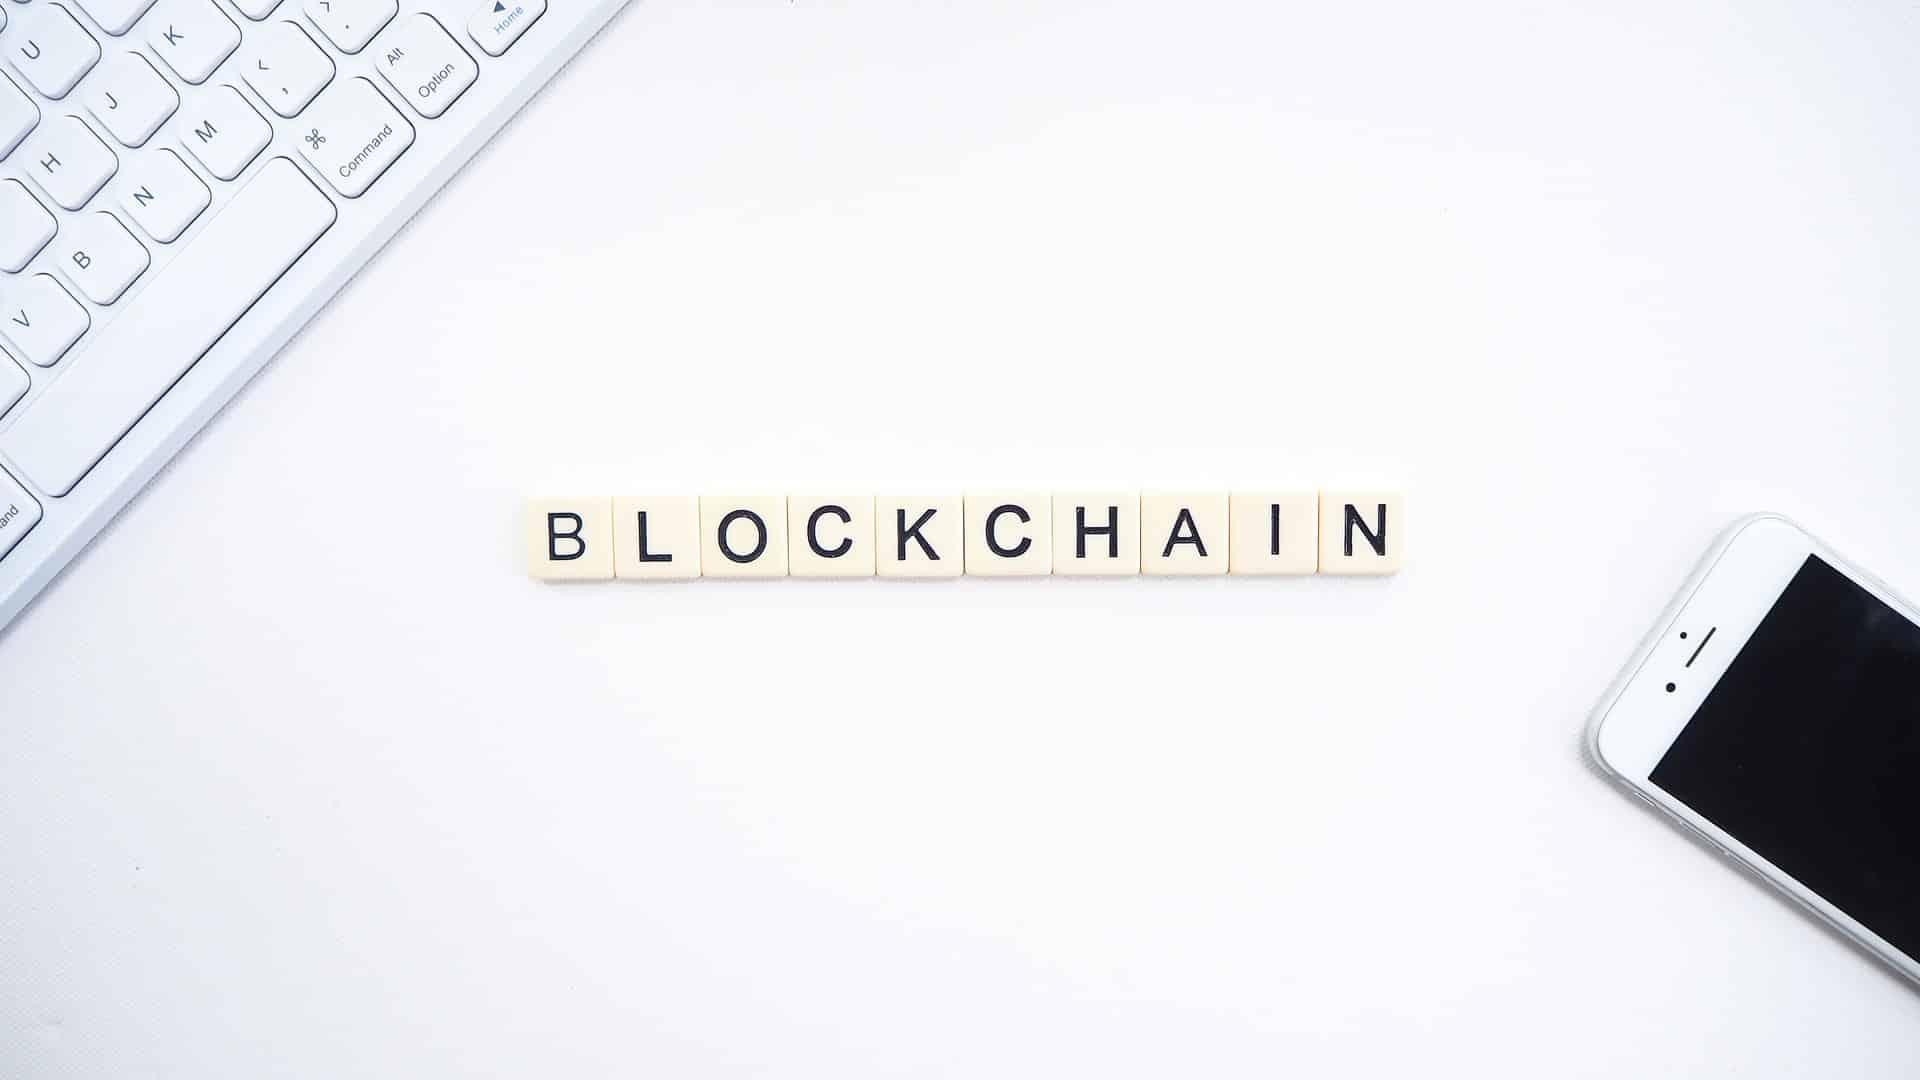 Blockchain Data Security Header Image